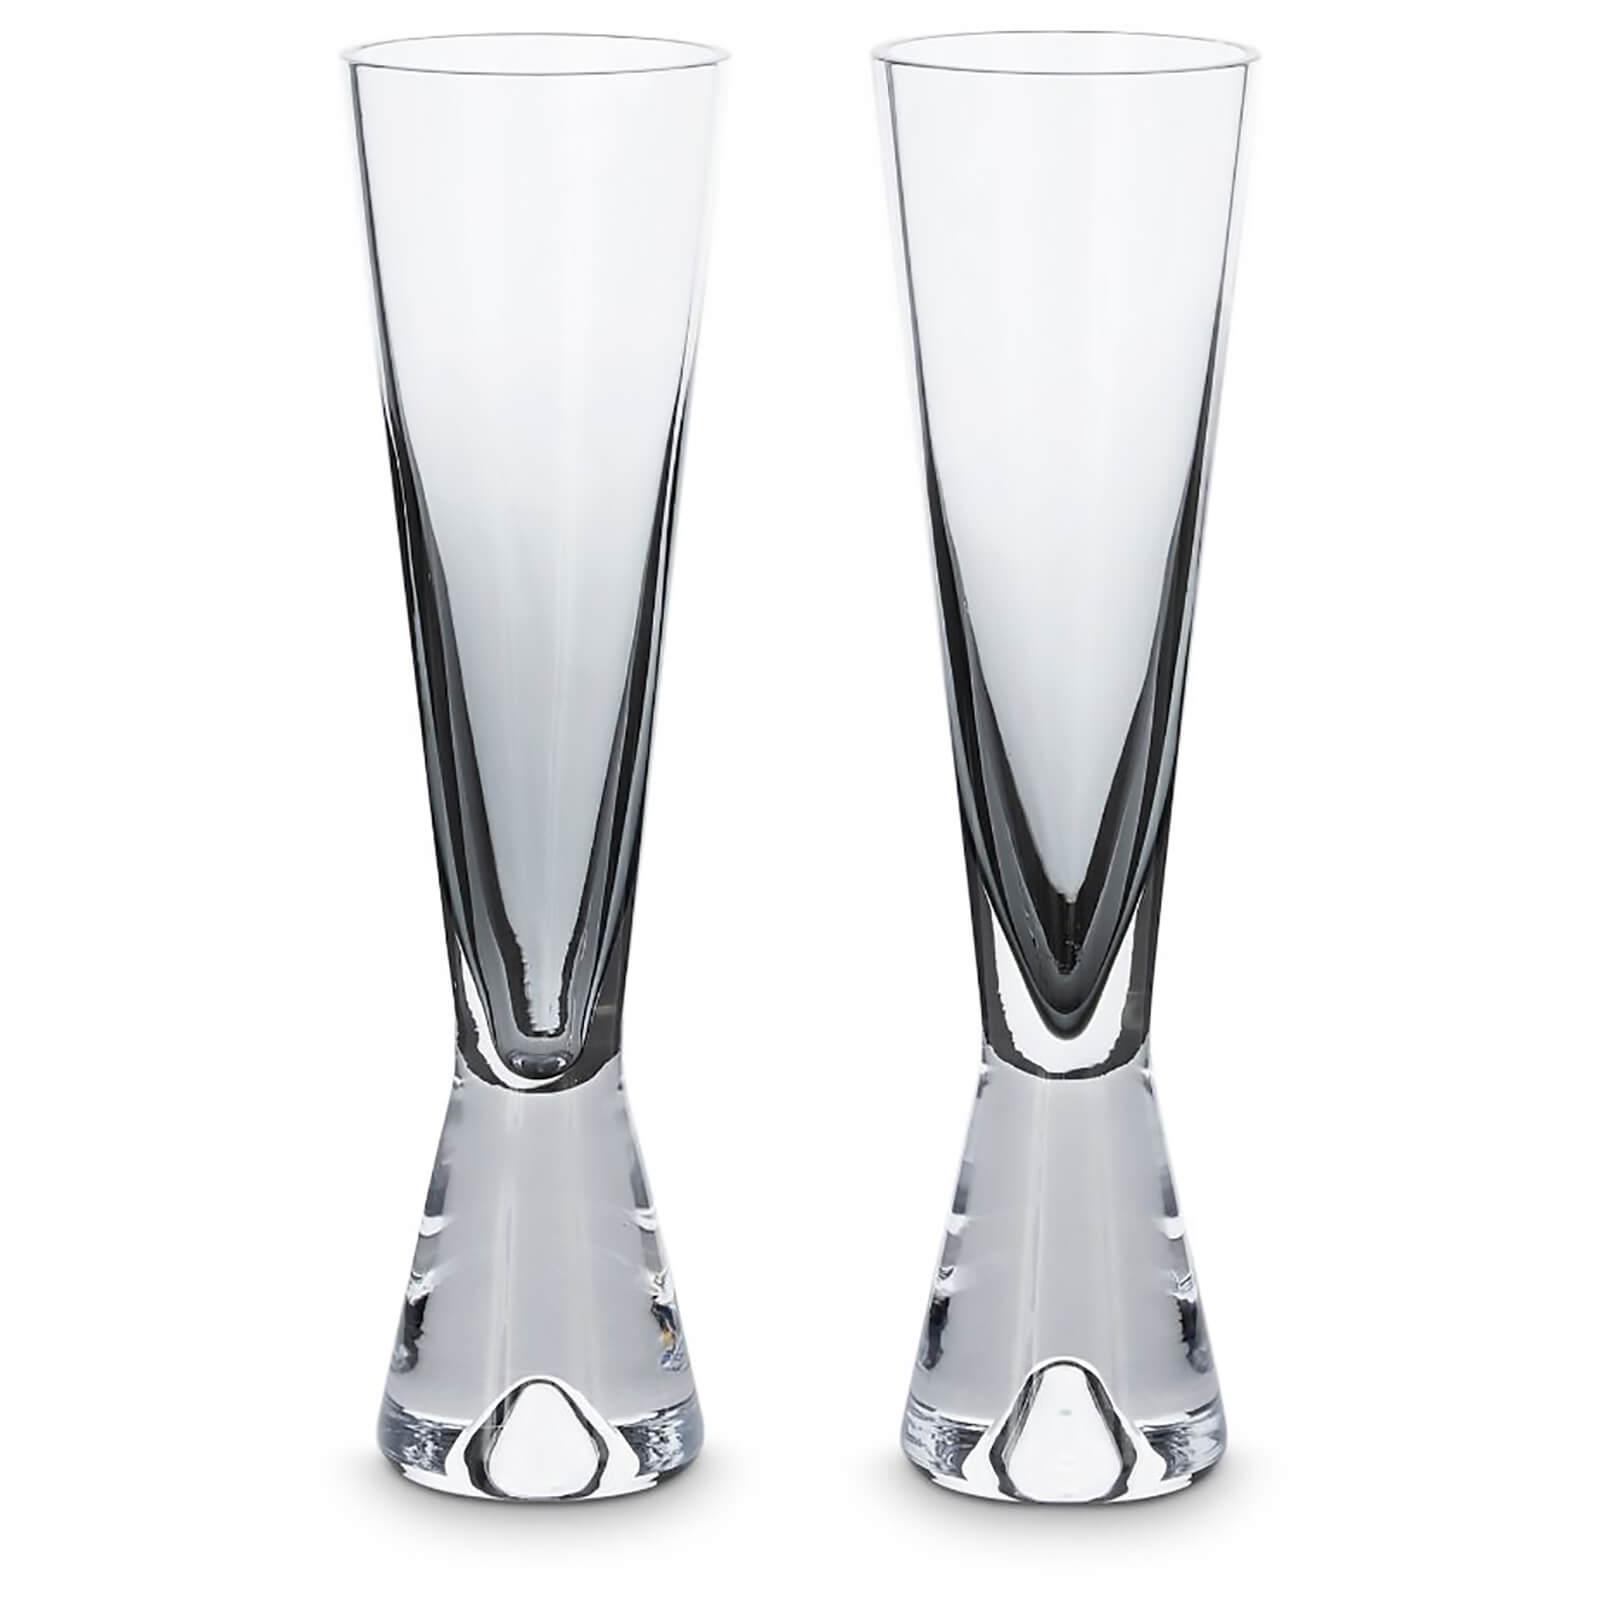 Tom Dixon Tank Champagne Glasses - Black